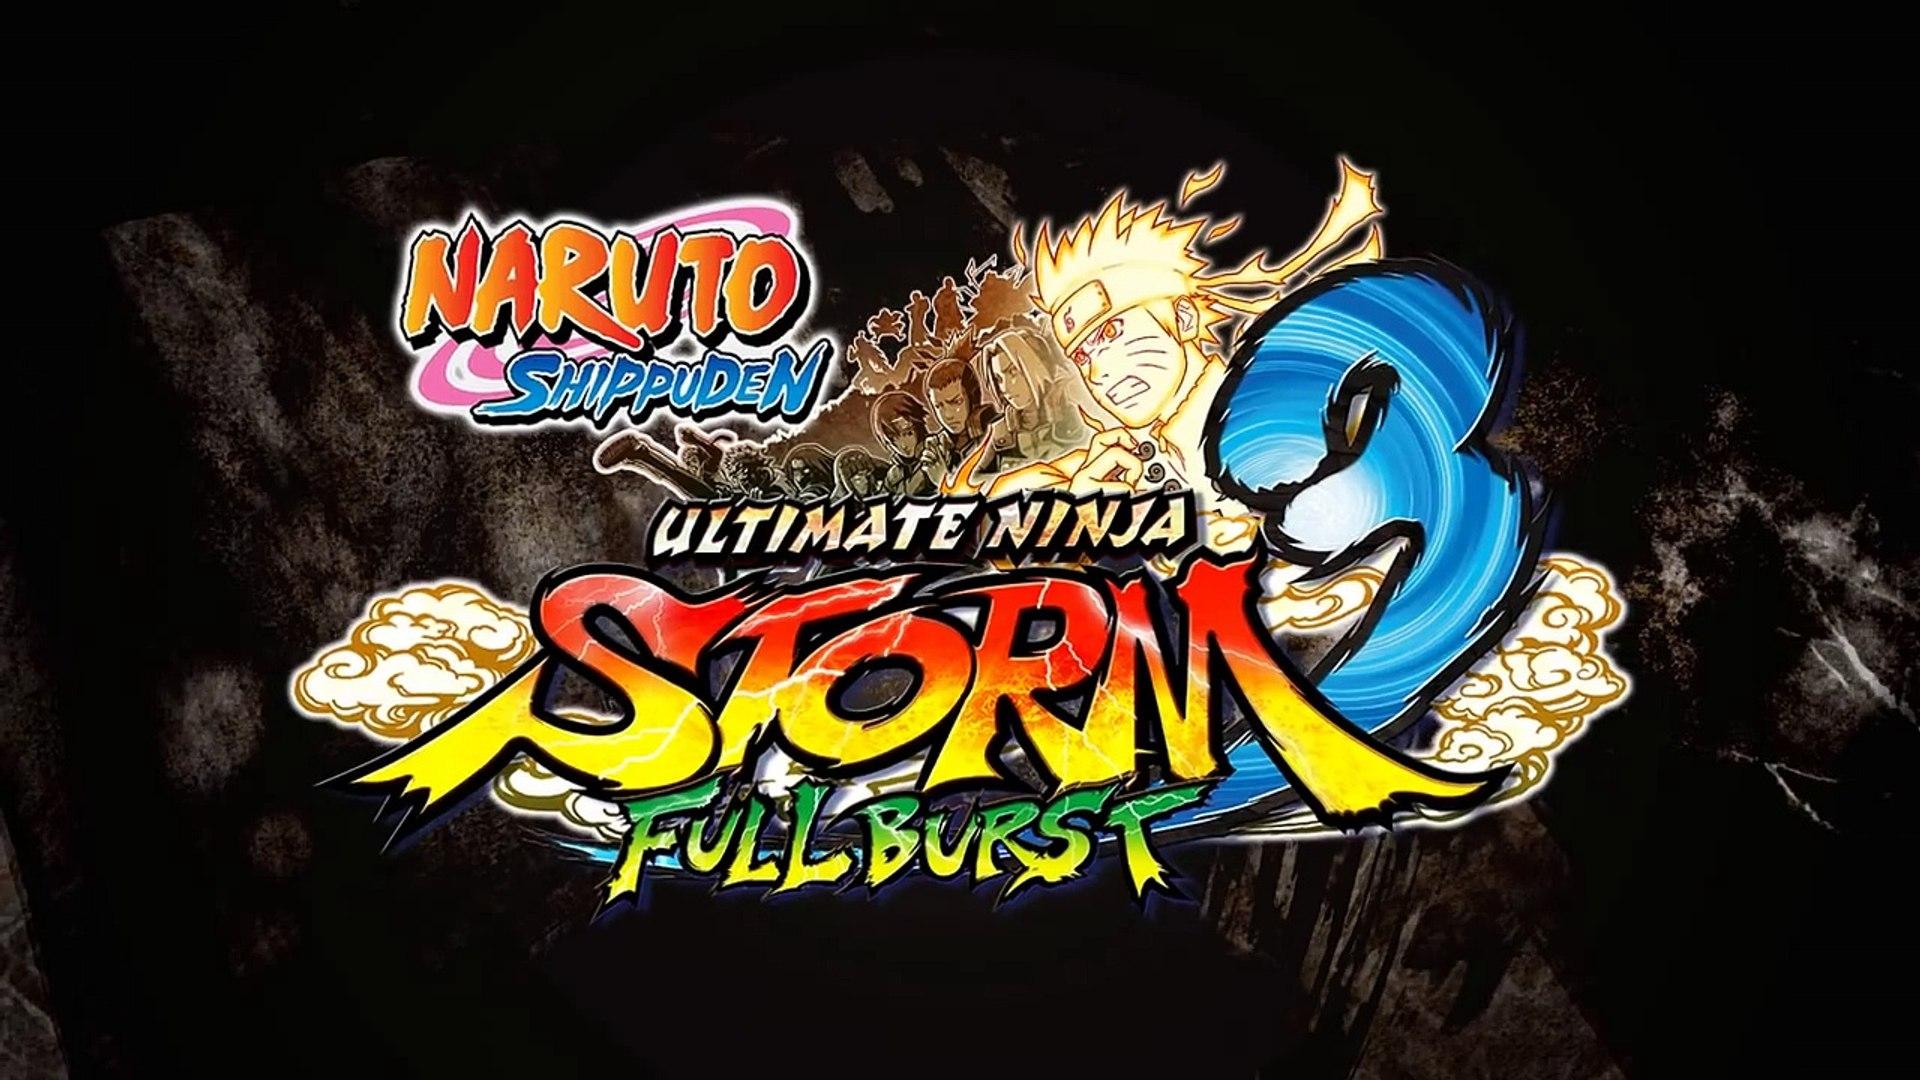 Naruto SUN Storm 3 Full Burst - PC/PSN/XBL - Sage Mode Kabuto